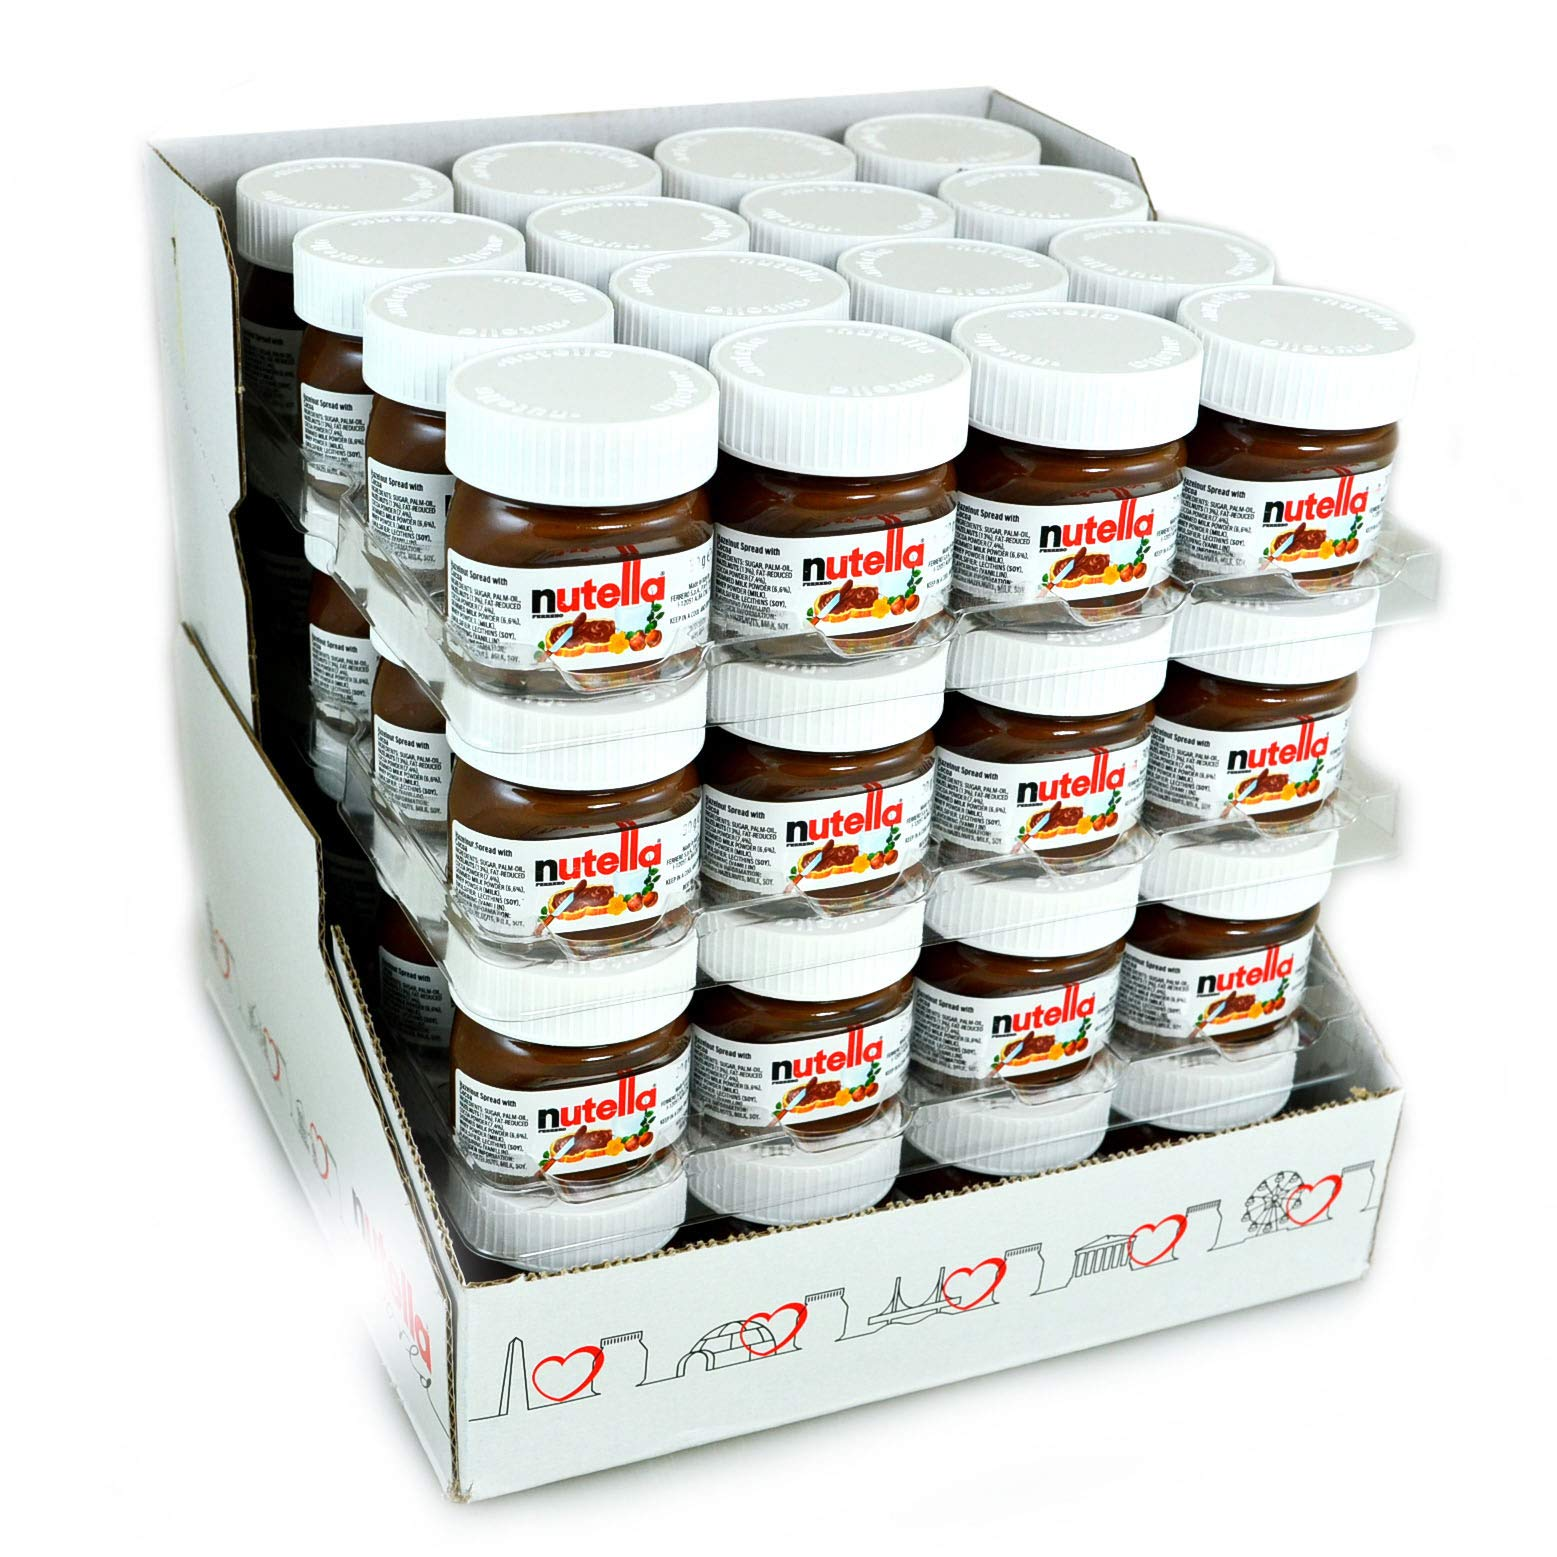 Nutella 25g mini jar - pack of 64